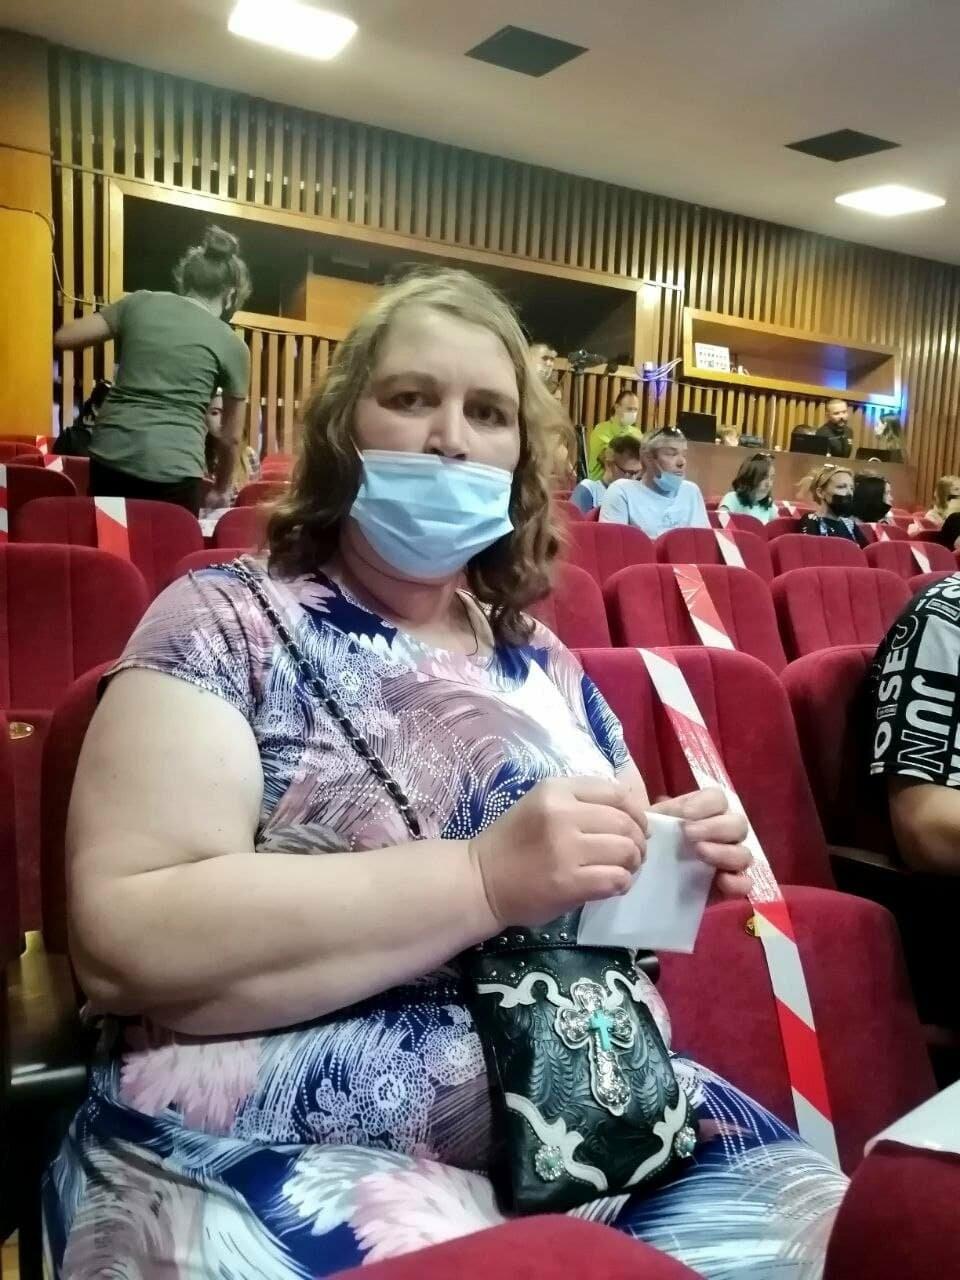 «Поверь в себя»: в Бердянске посвятили концерт проблемам молодежи, фото-4